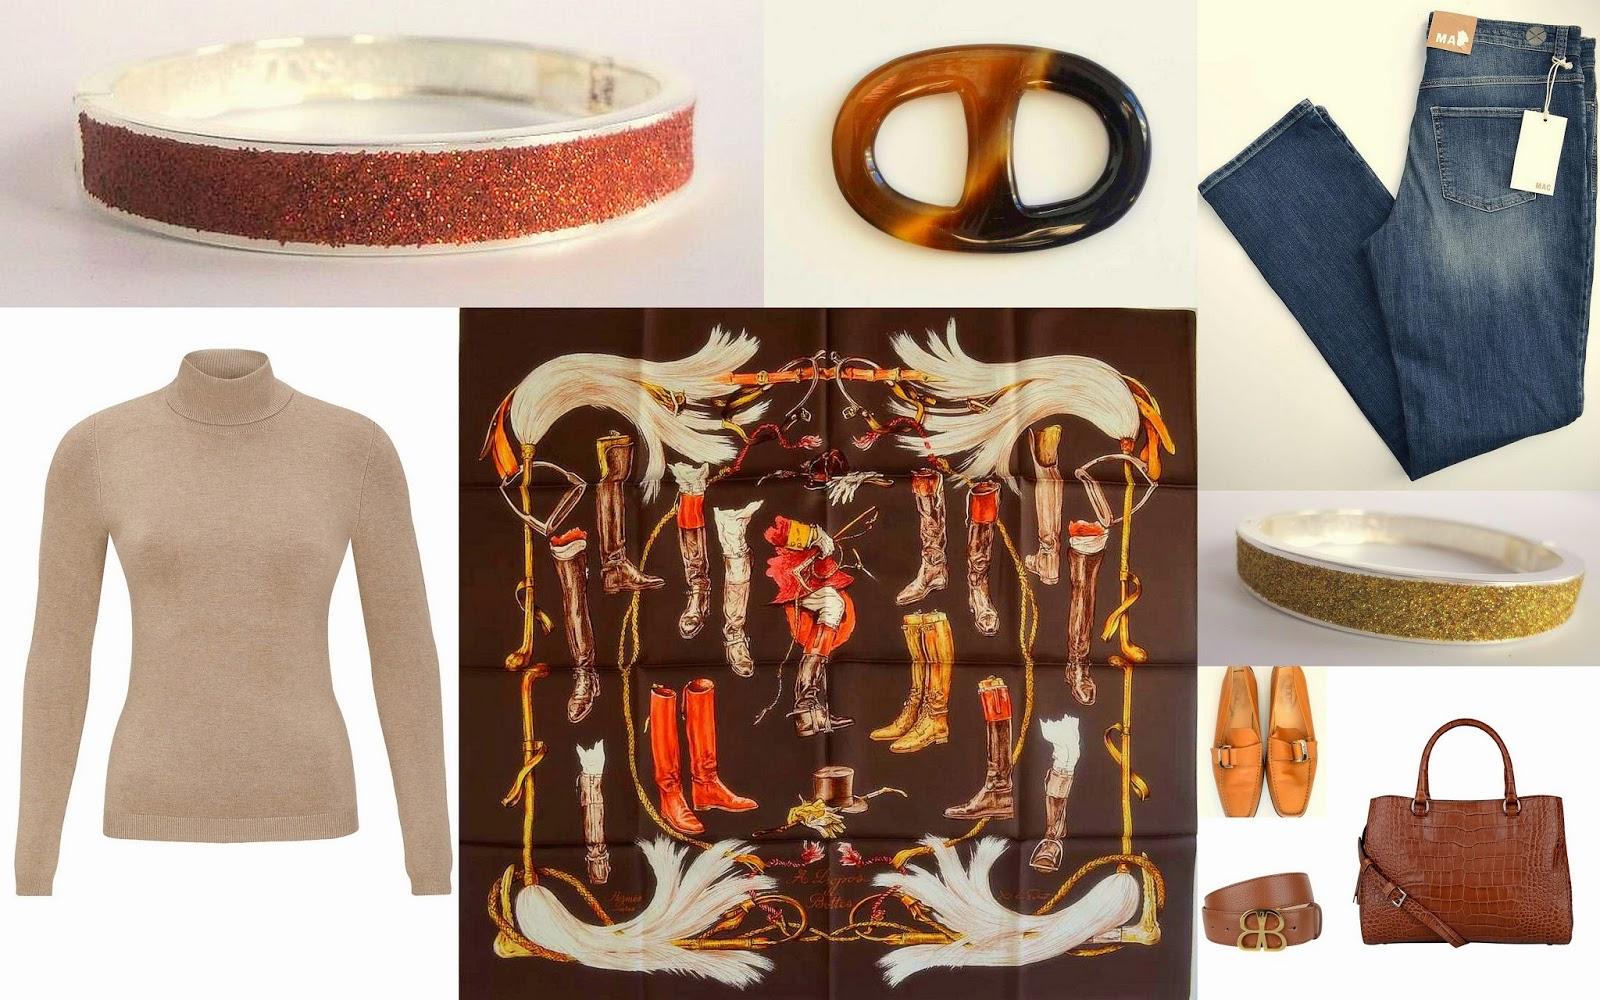 camilieri s bilderbuch schalringe scarf rings longchamp und hermes a propos de bottes 2. Black Bedroom Furniture Sets. Home Design Ideas